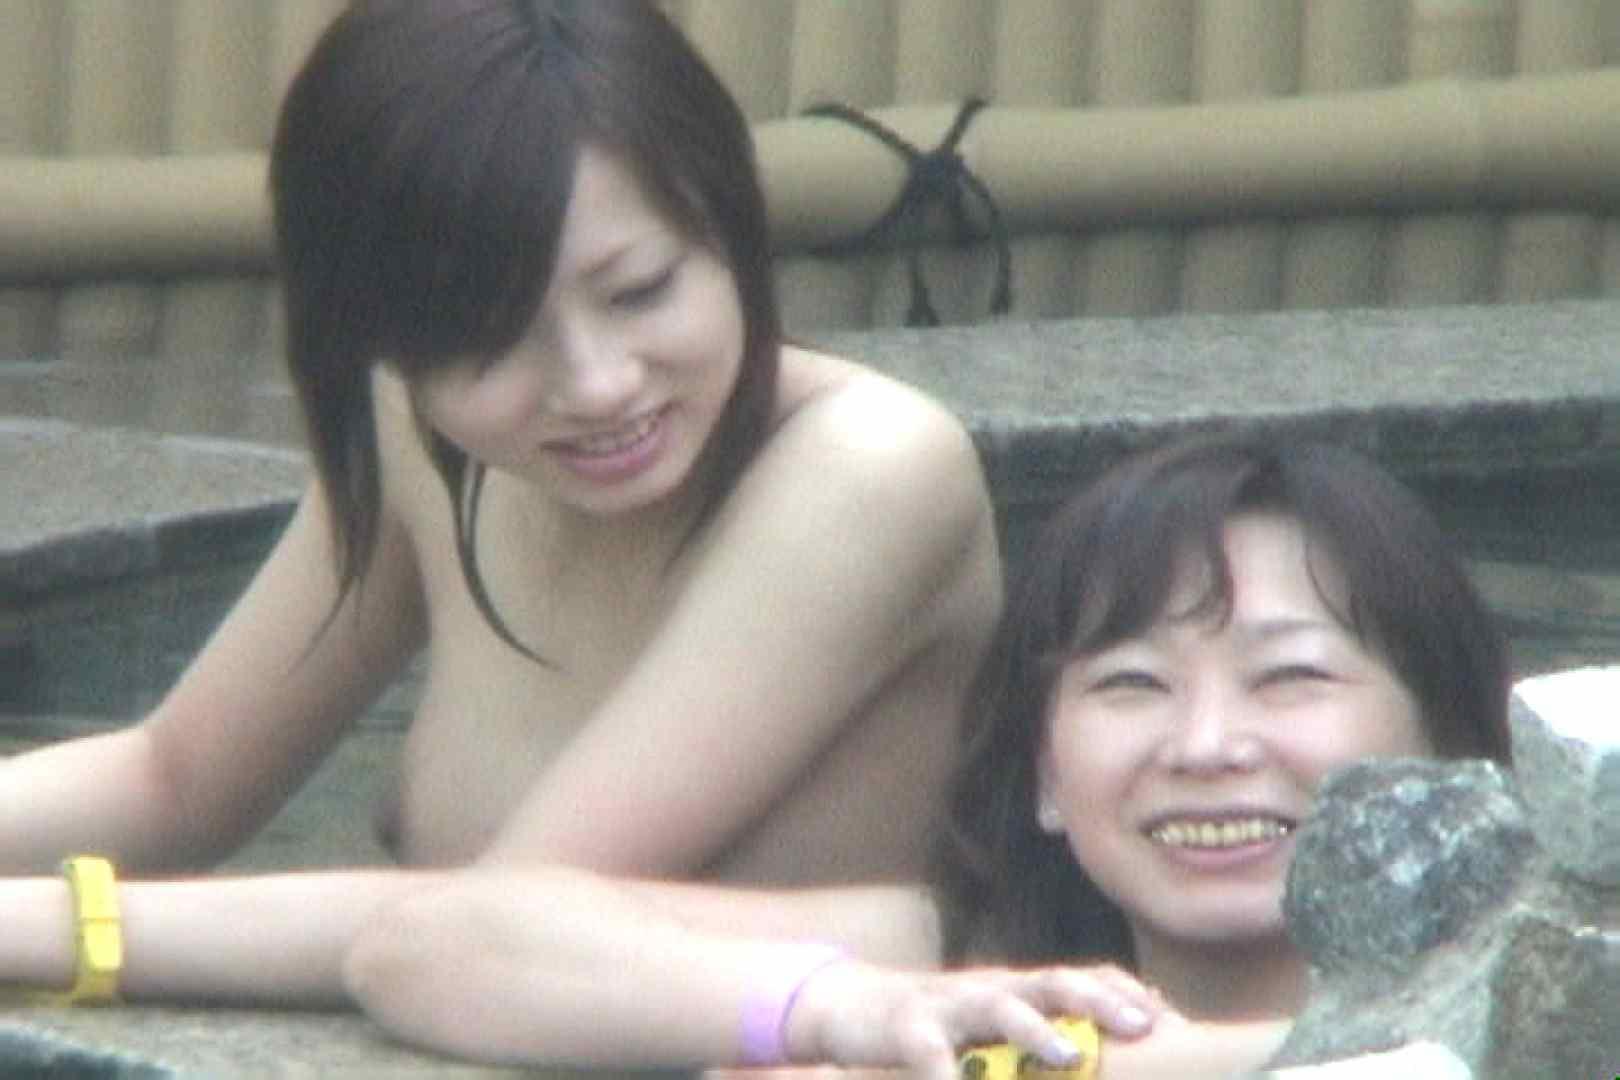 Aquaな露天風呂Vol.58【VIP限定】 HなOL | 0  95pic 81